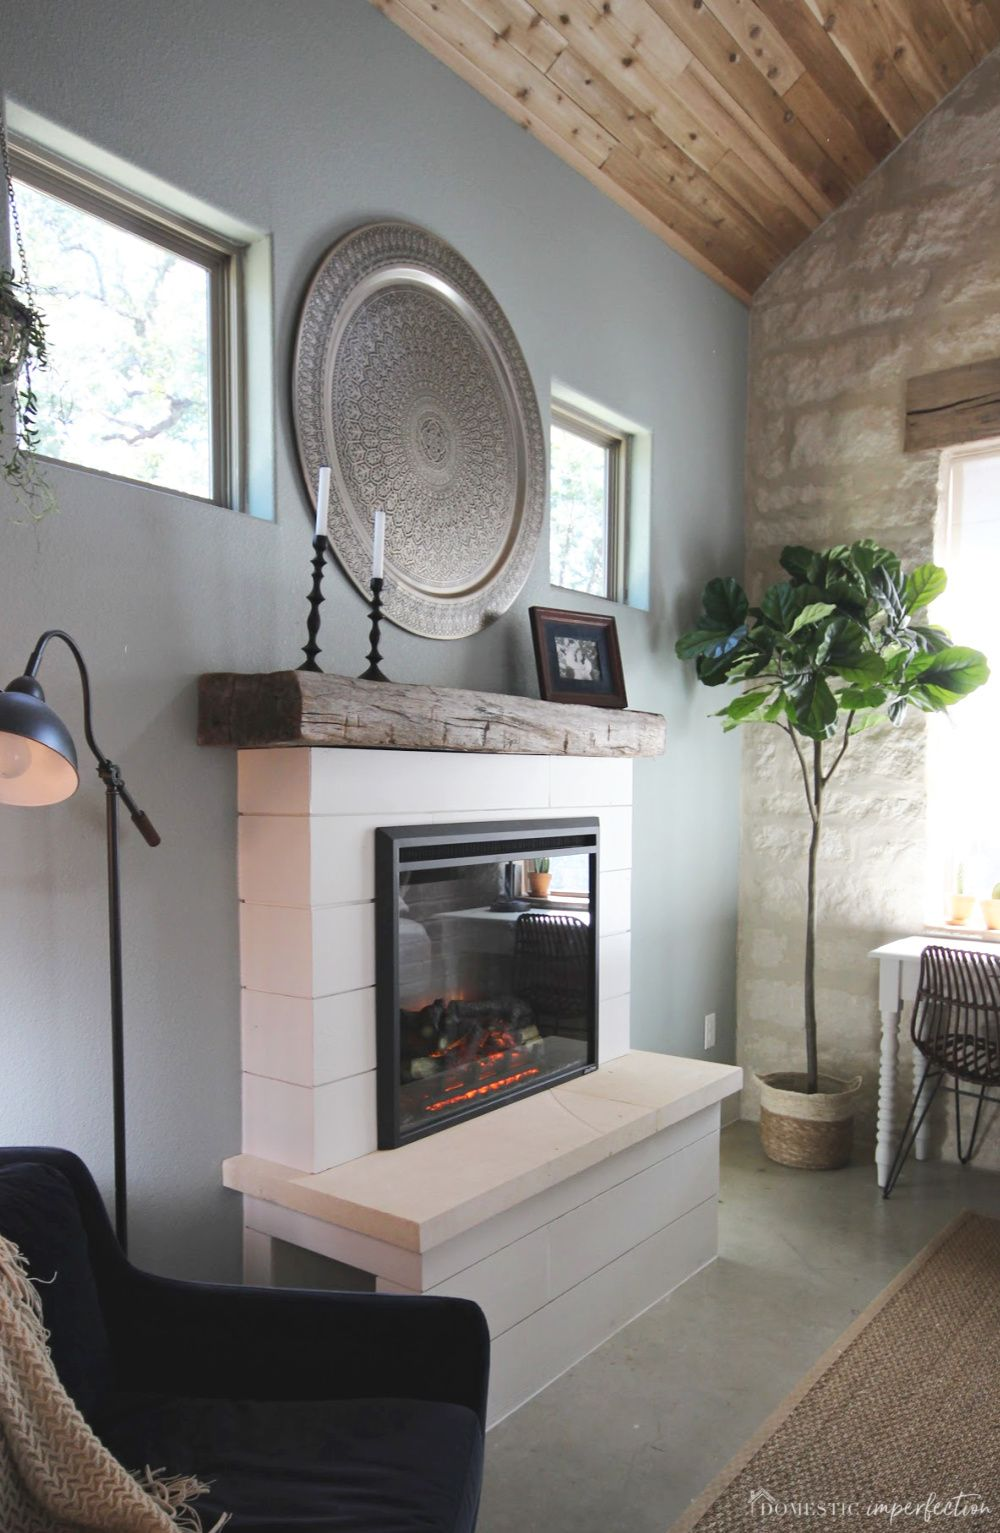 Diy electric fireplace diy fireplace electric fireplace